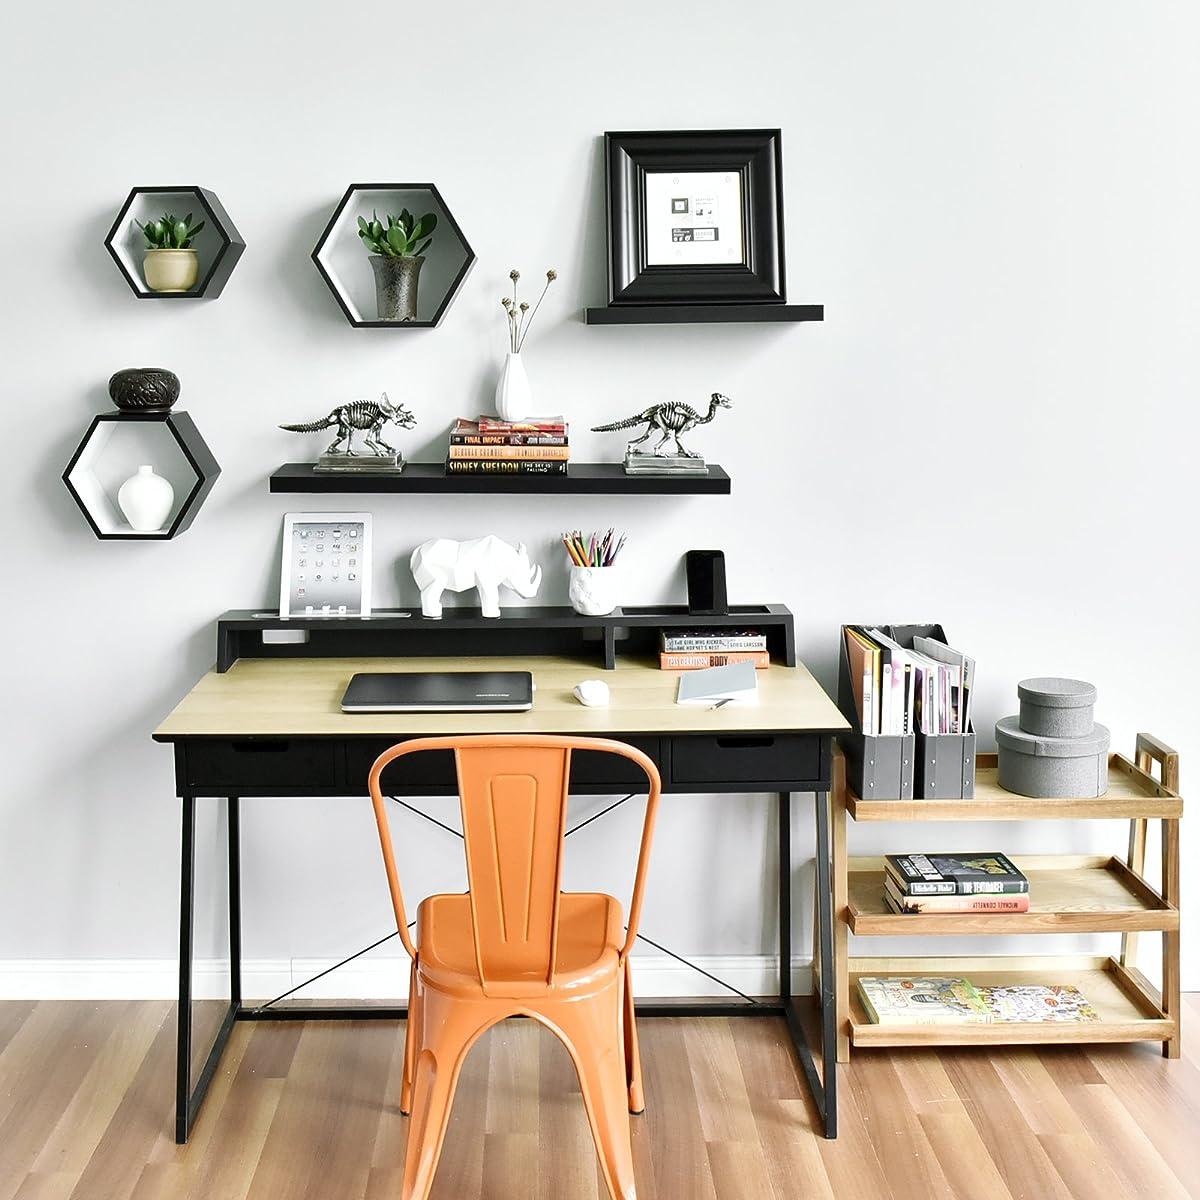 WELLAND Simons Floating Wall Shelf Ledge Shelves, 36-Inch, Black